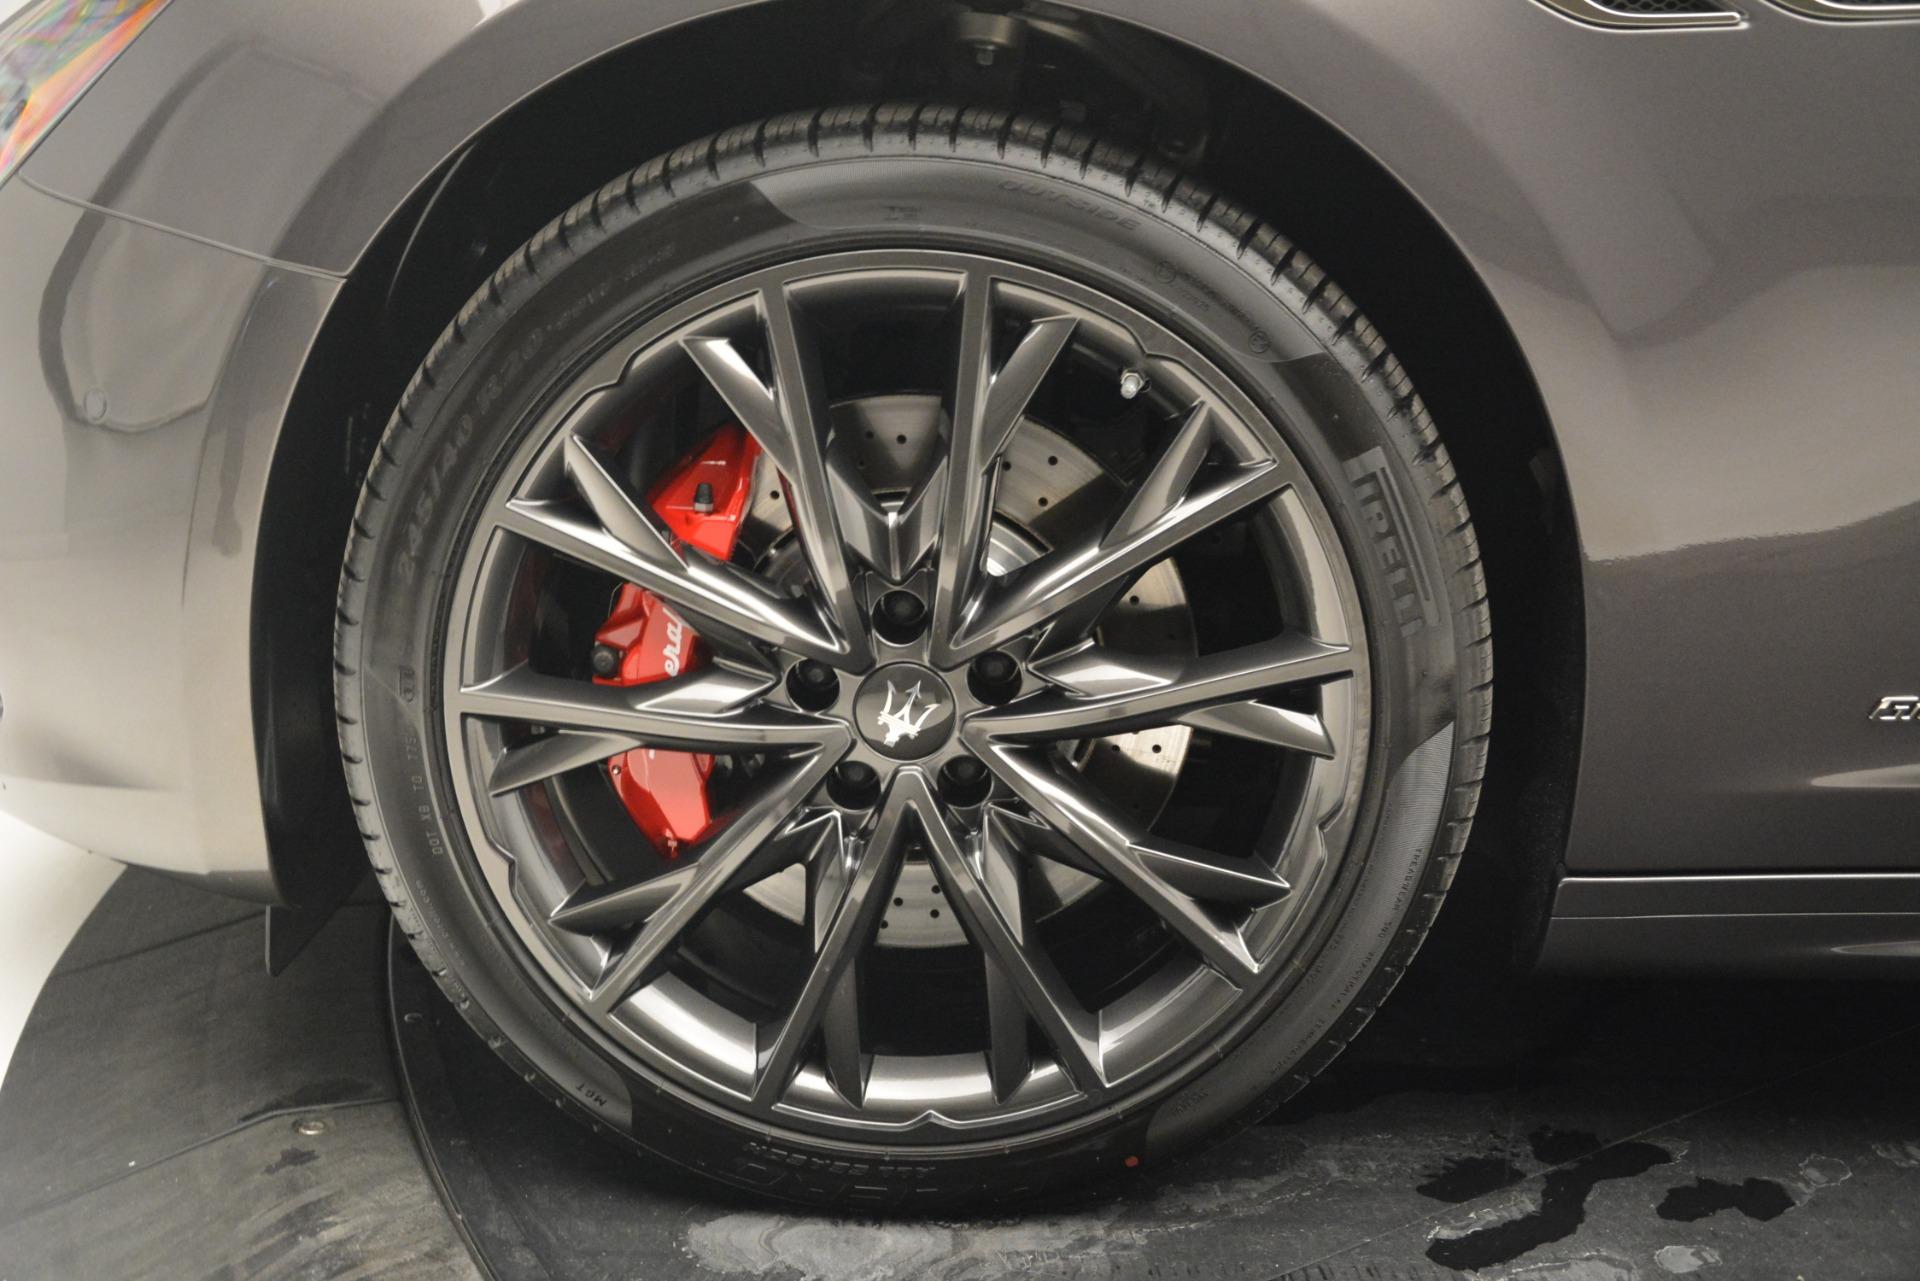 New 2019 Maserati Ghibli S Q4 GranSport For Sale In Greenwich, CT 2925_p26